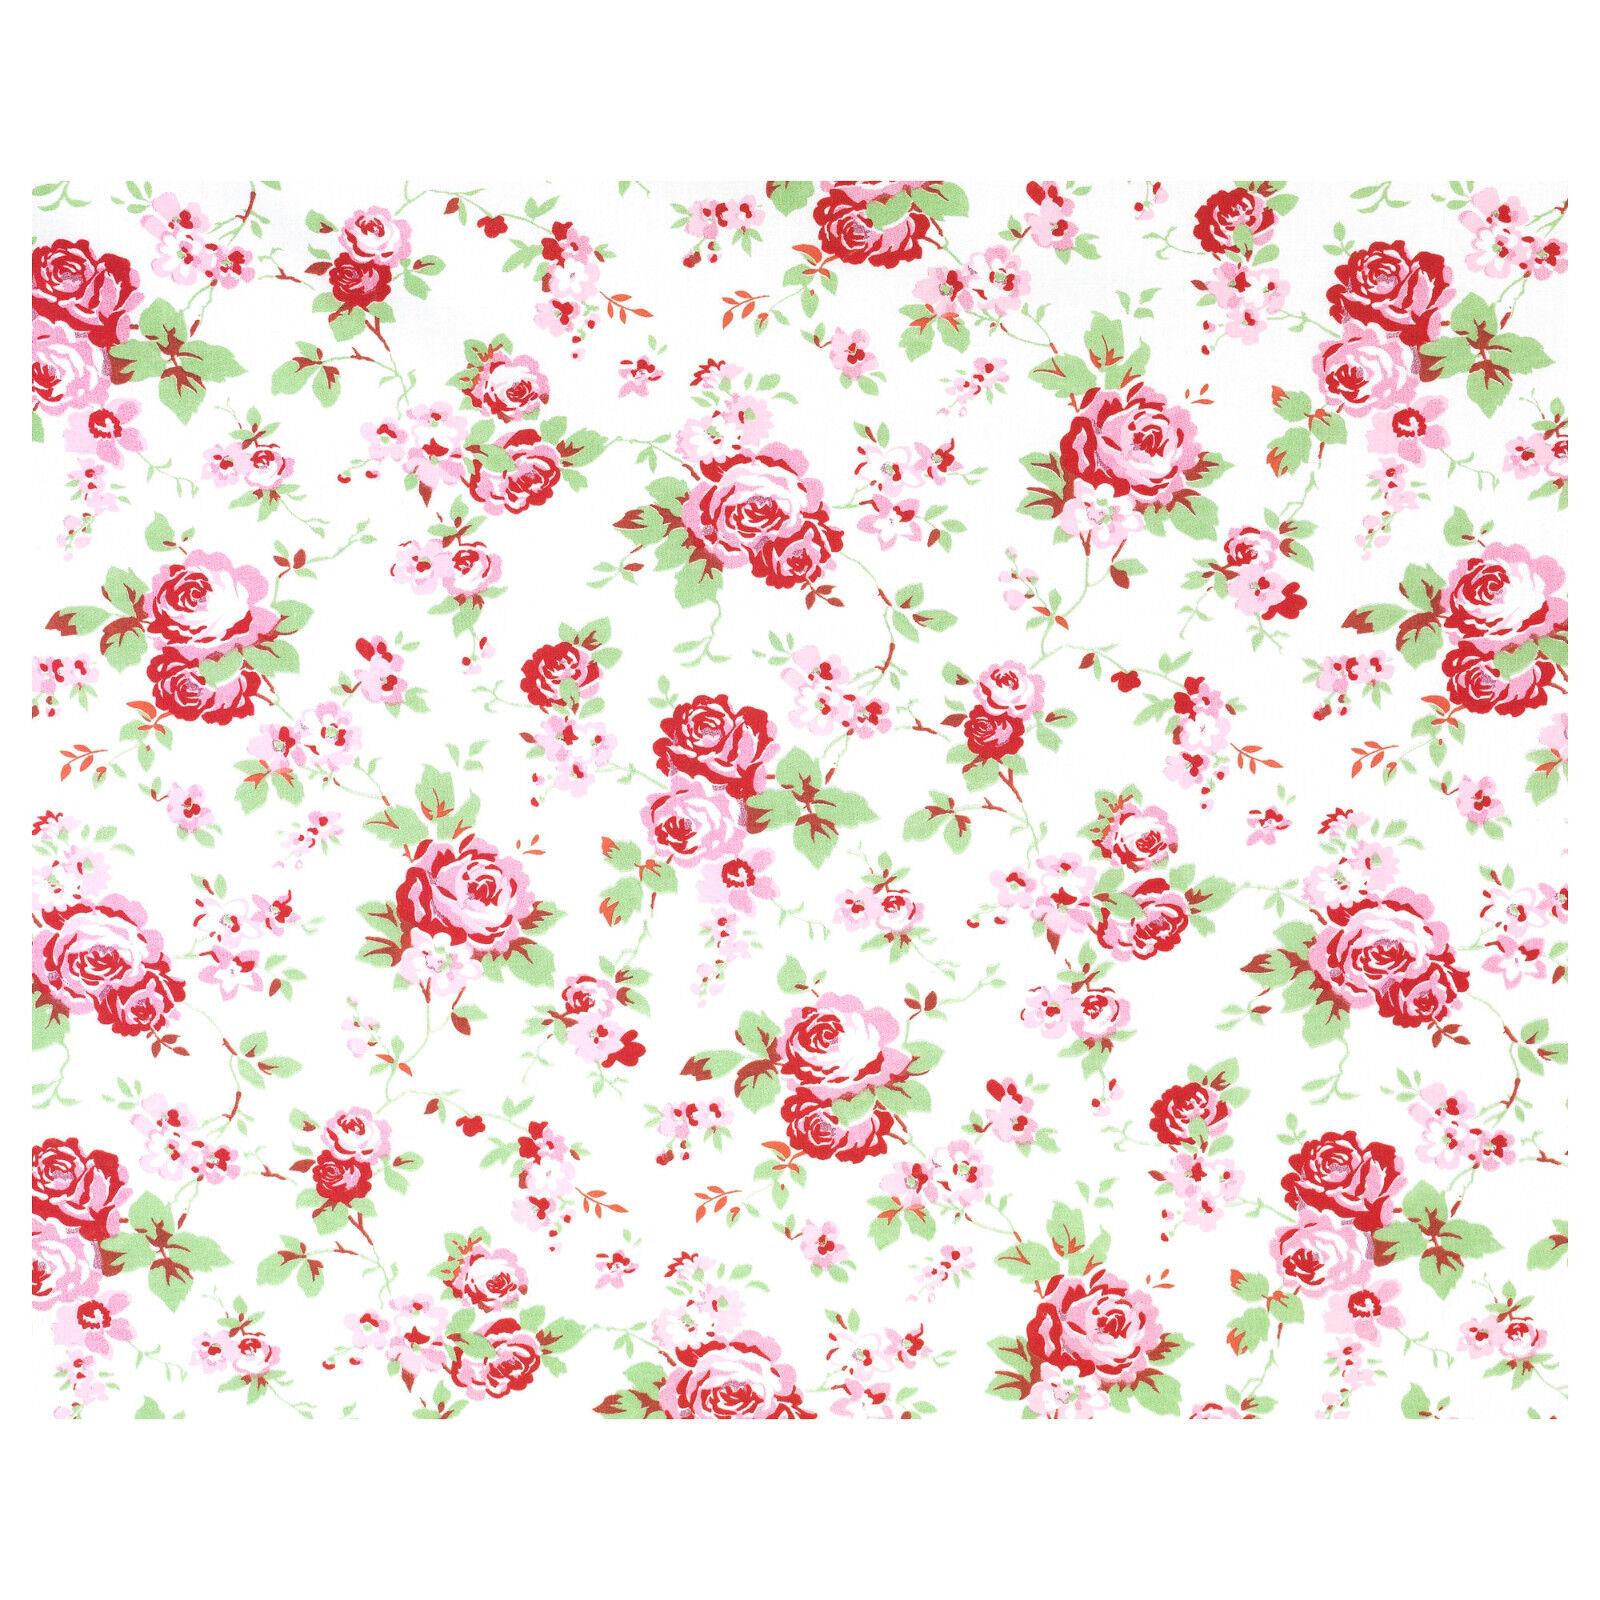 Ikea Stoff Meterware Rosali weiß 50 x 150 cm Baumwolle Rosen Handarbei nähen neu